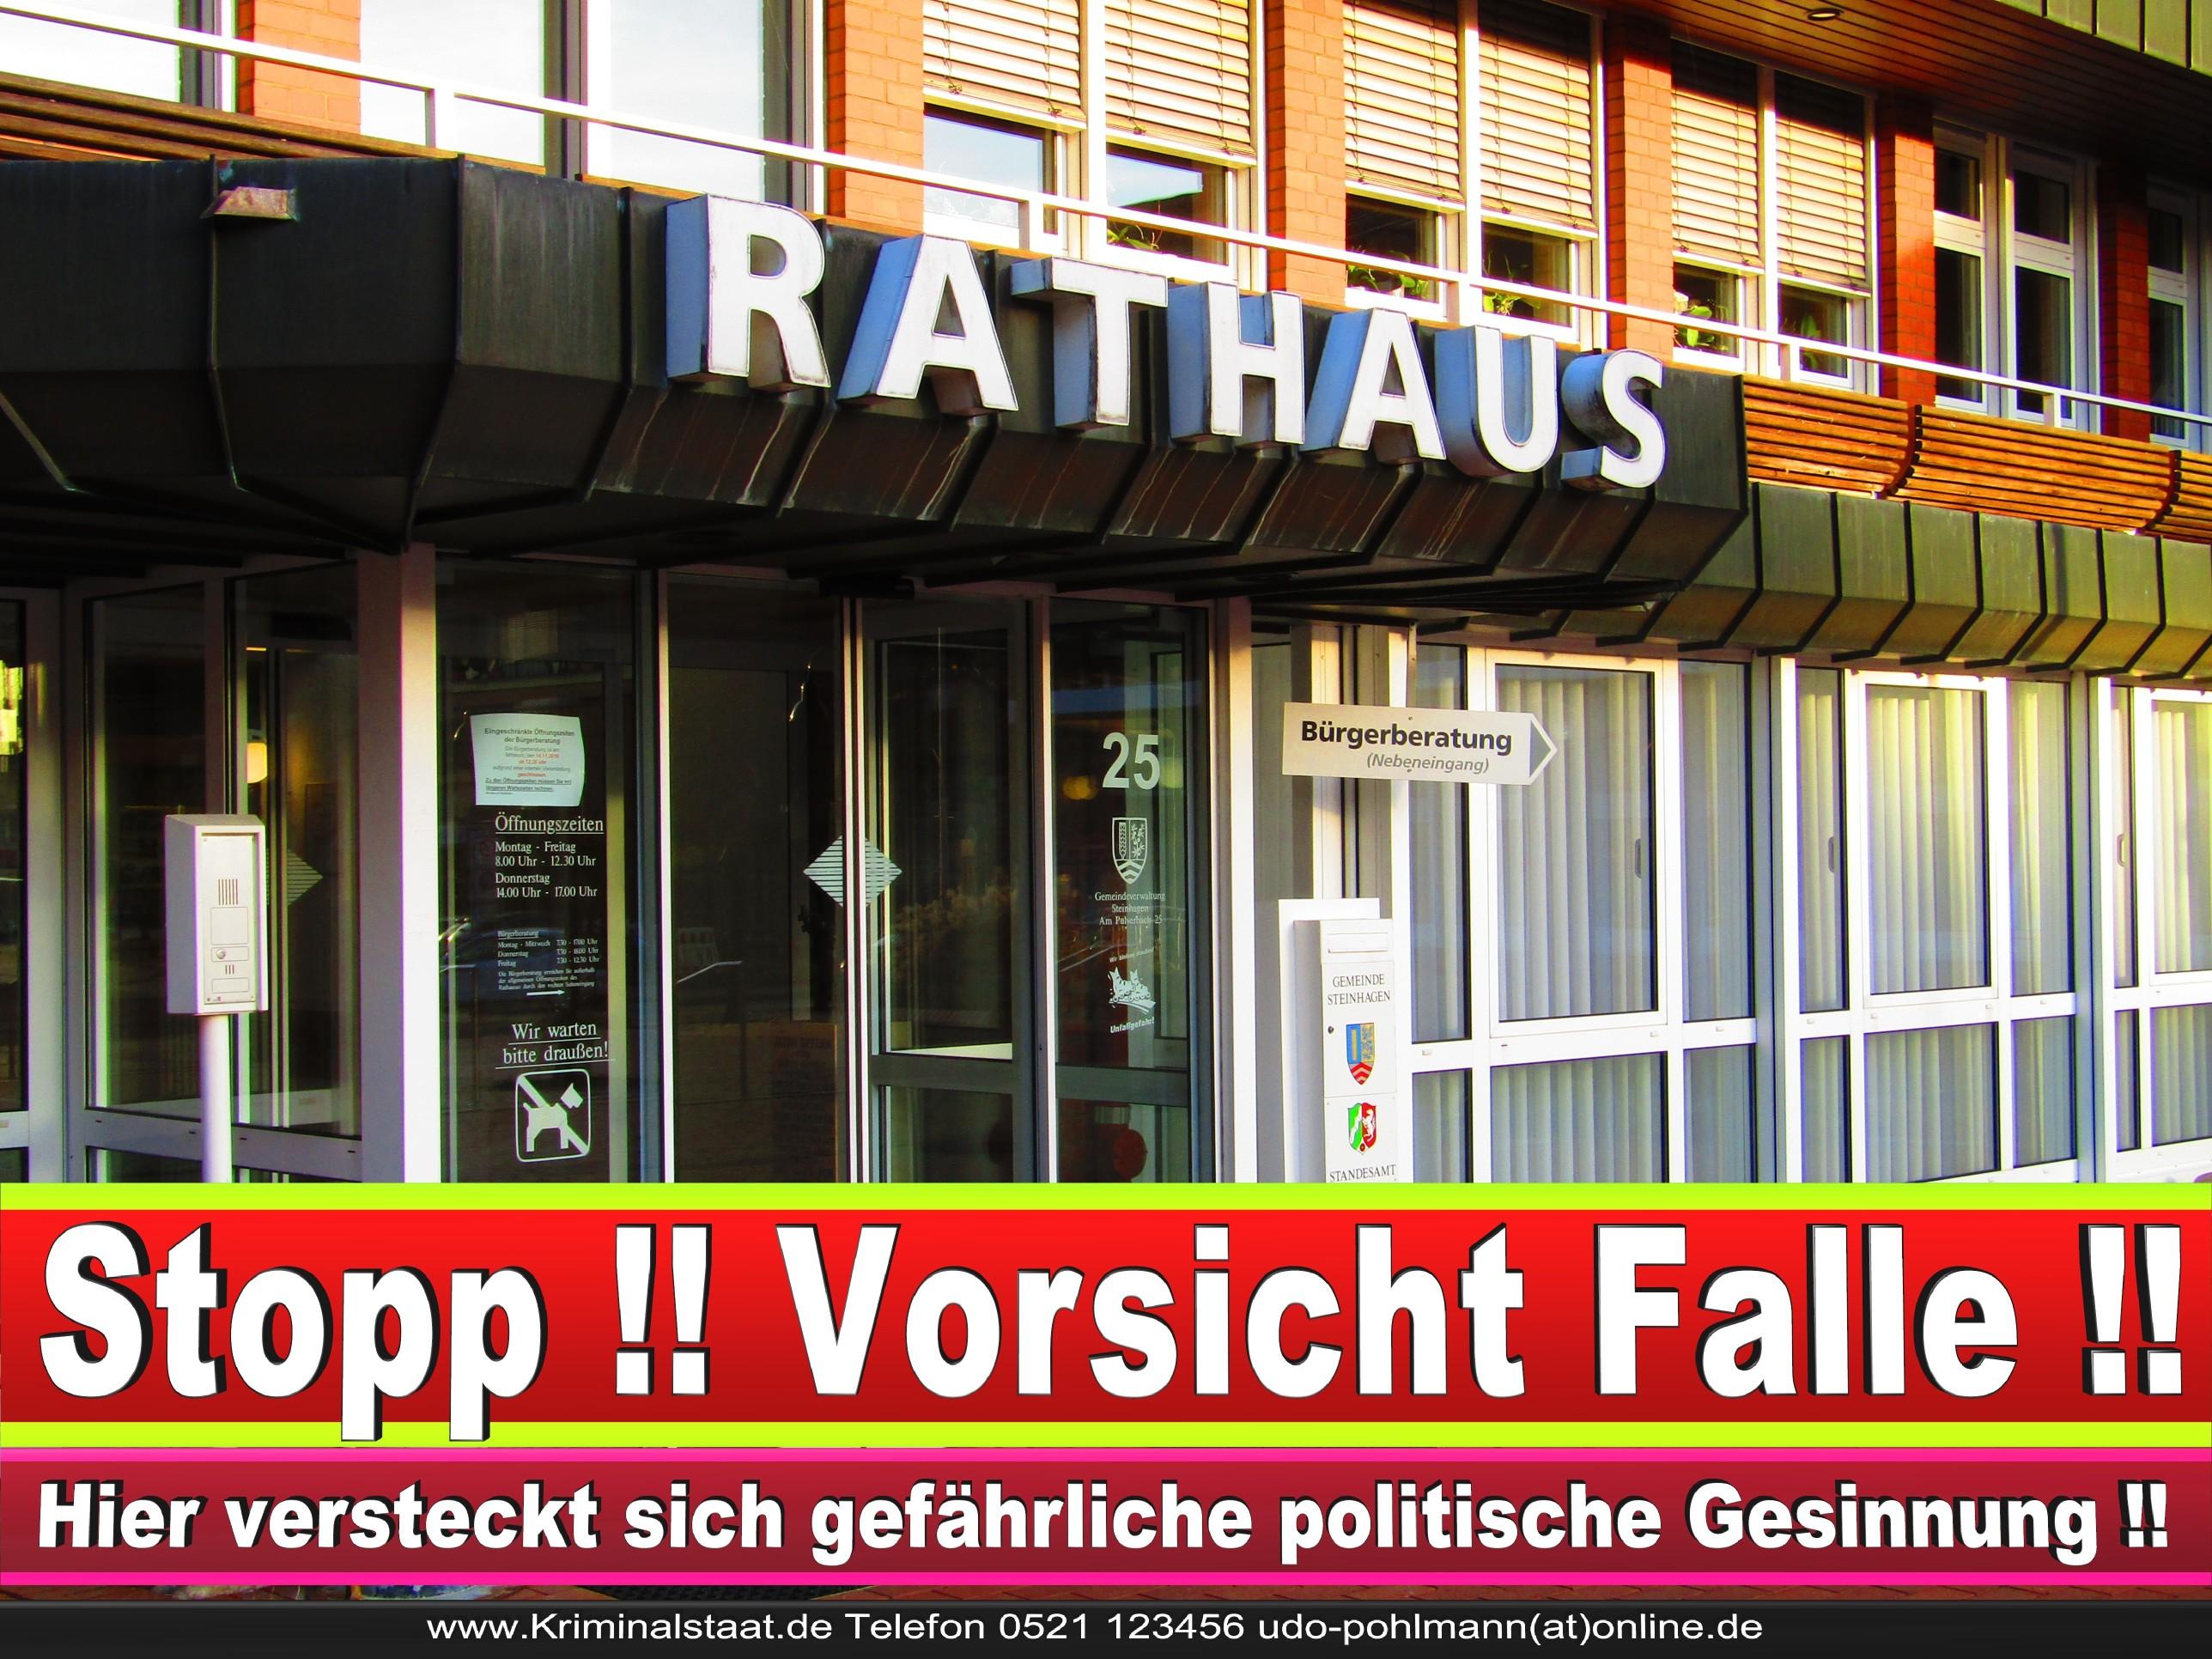 Rathaus Steinhagen CDU SPD FDP Ortsverband CDU Bürgerbüro CDU SPD Korruption Polizei Bürgermeister Karte Telefonbuch NRW OWL (21)